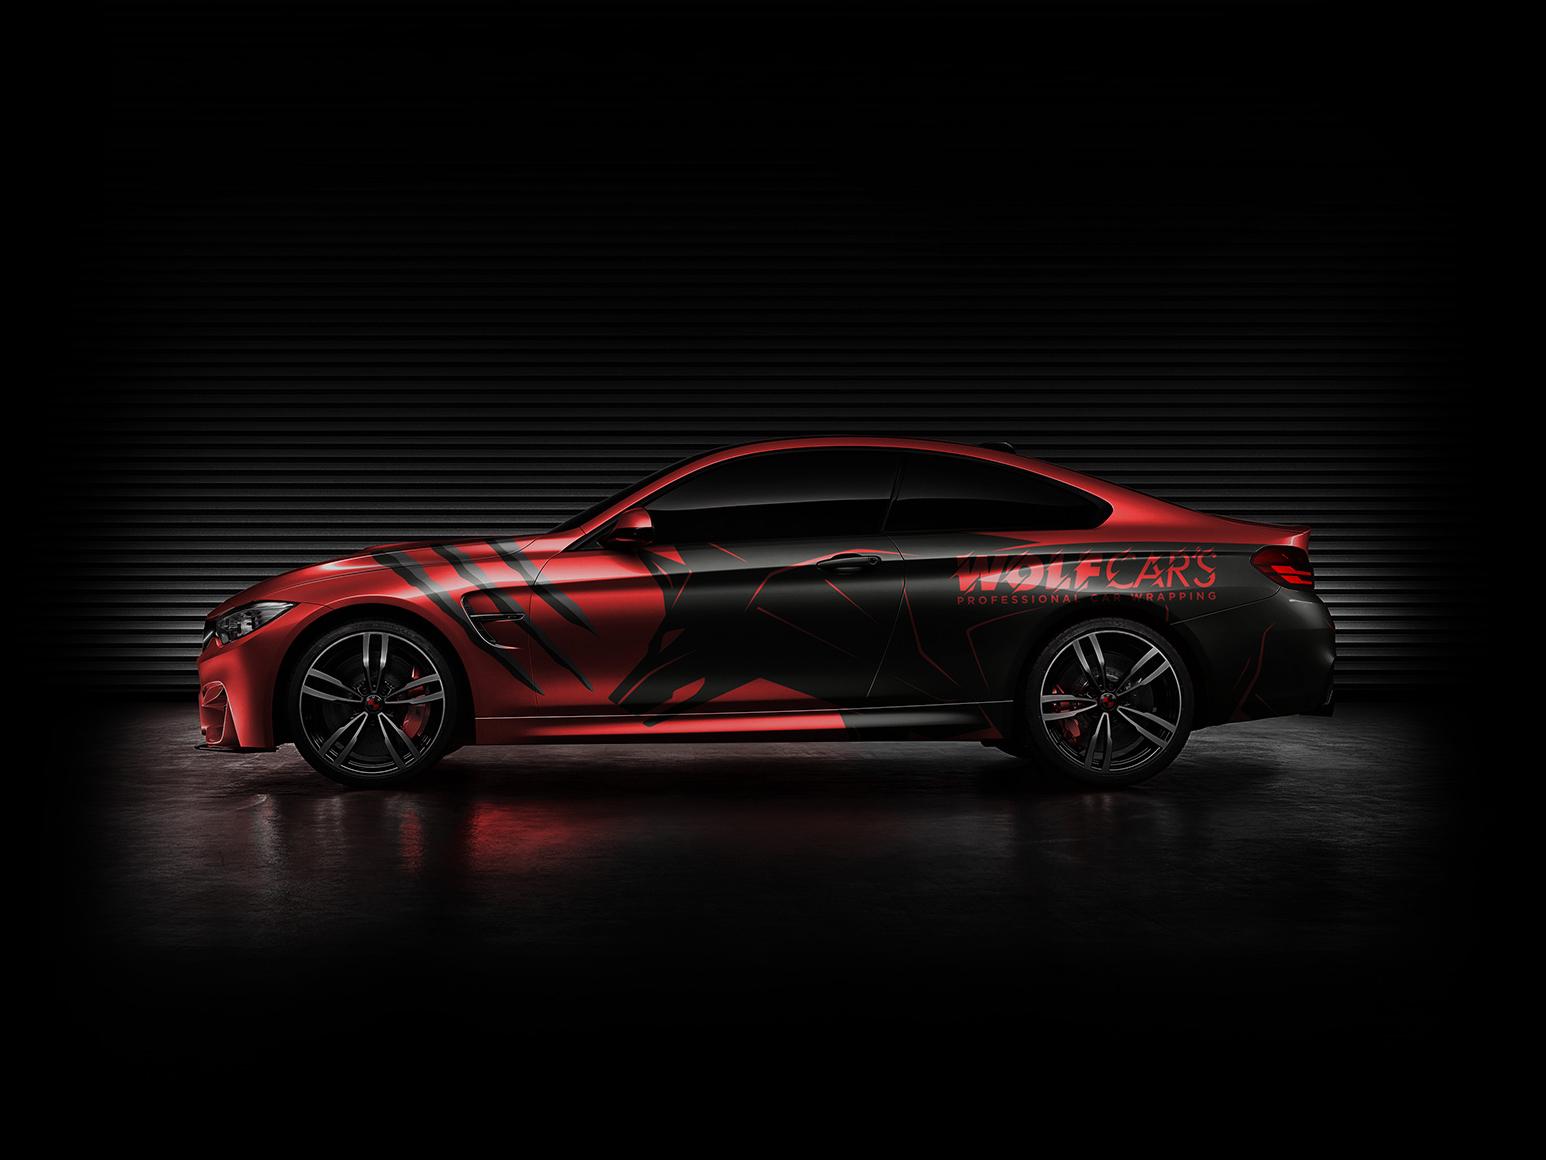 Wolf Cars Bmw M4 Wrap Design By Altug Karakahya On Dribbble